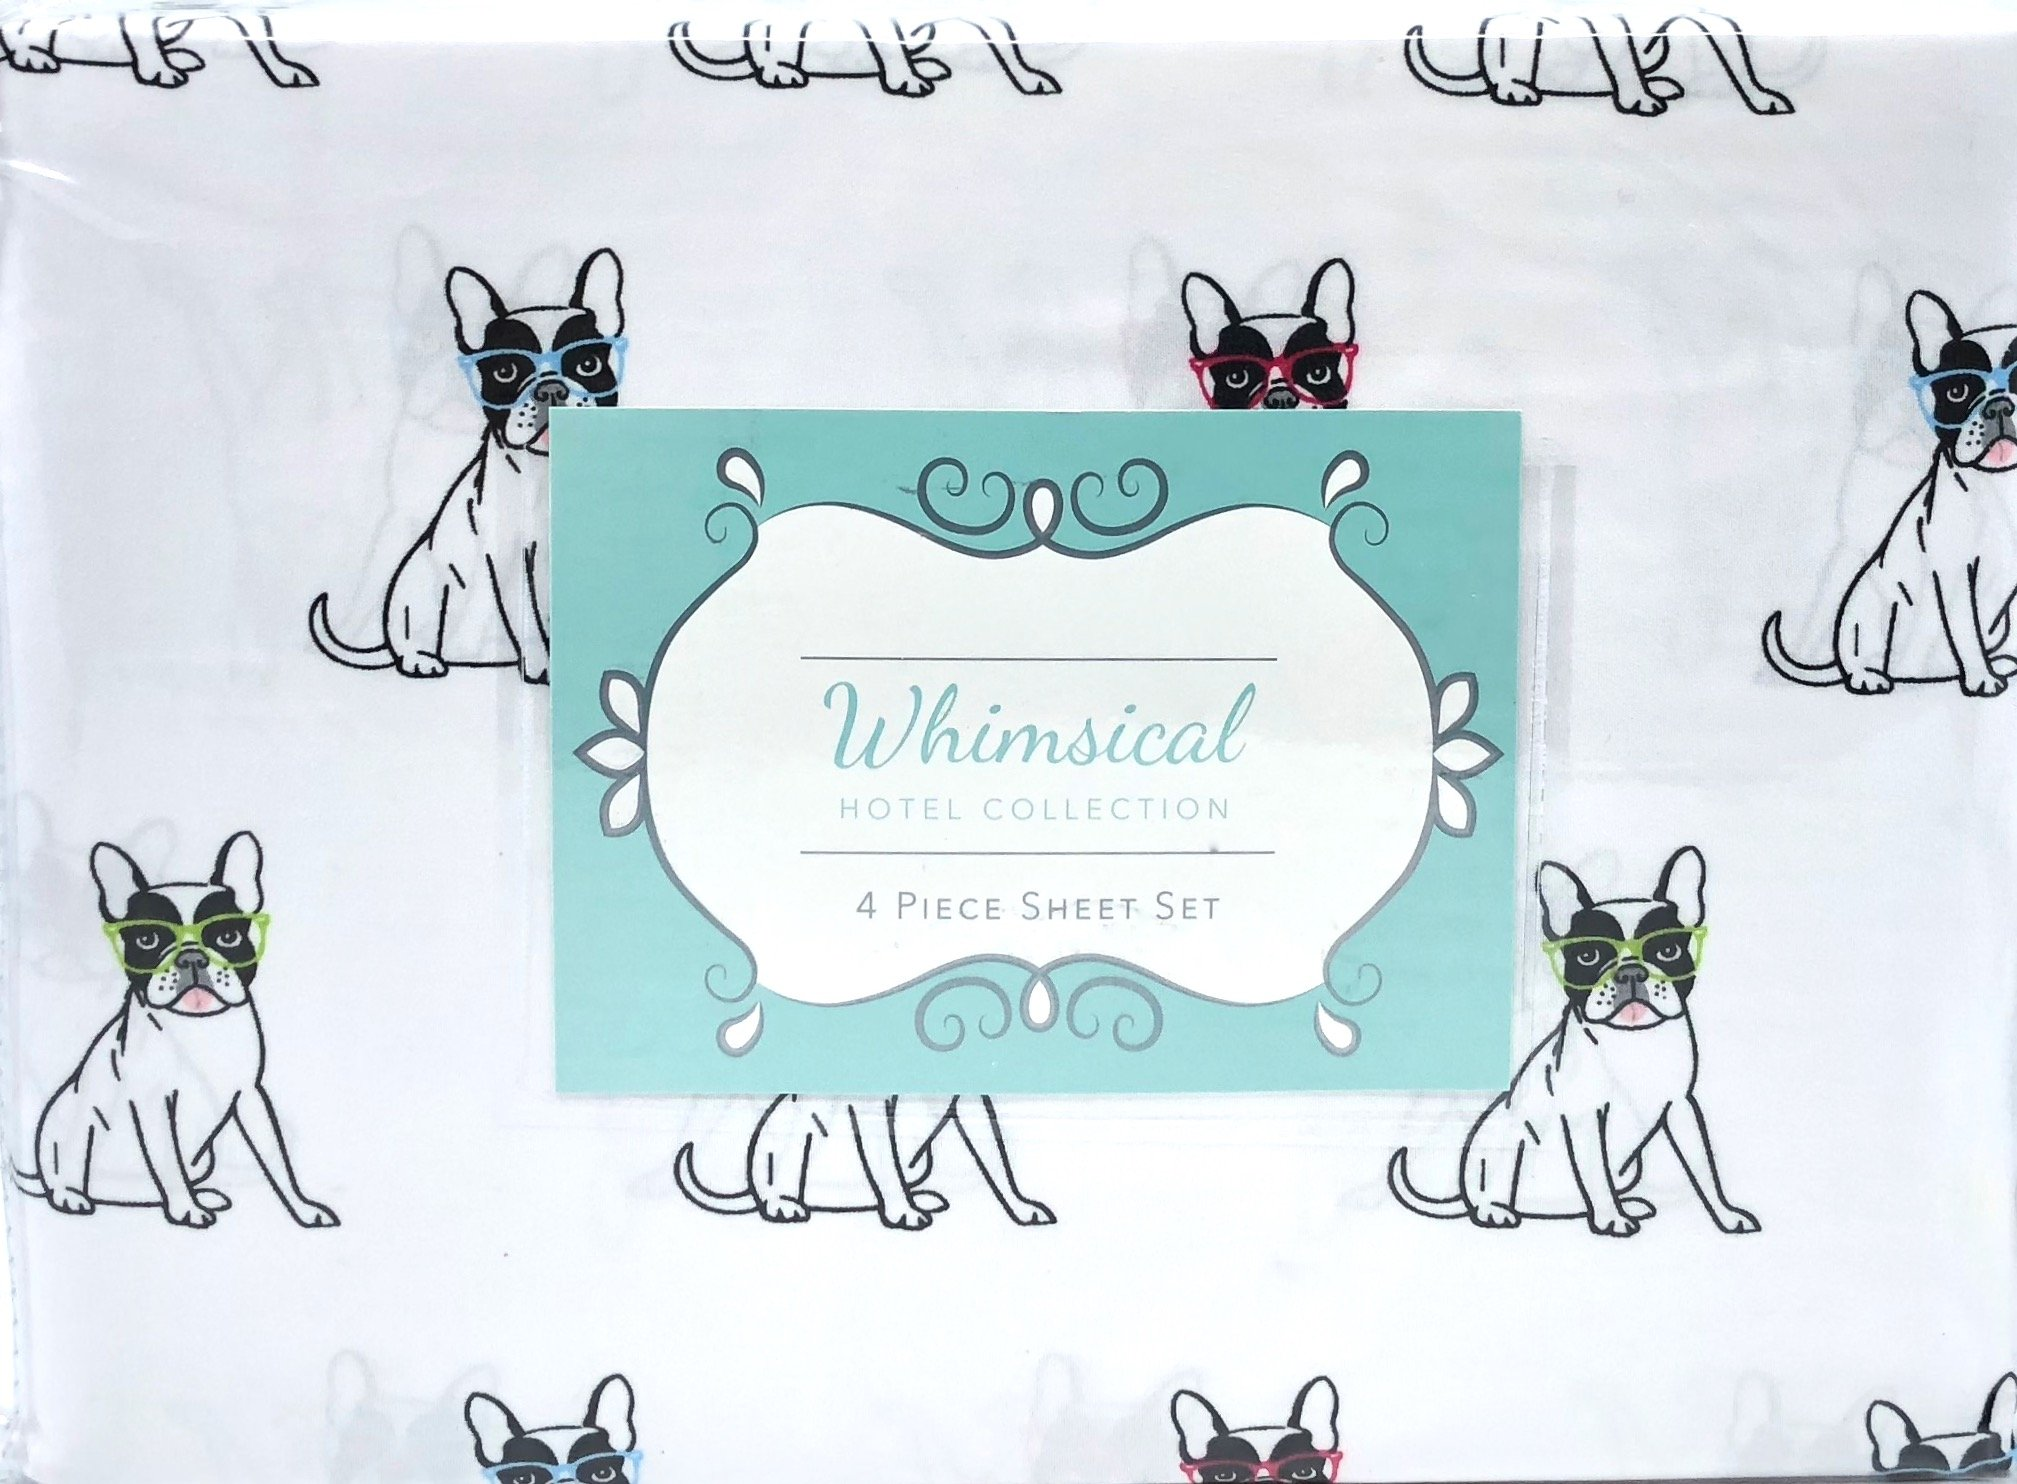 Whimsical Hotel Collection Smarty Dog Bulldog 4 Piece Full Size Sheet Set